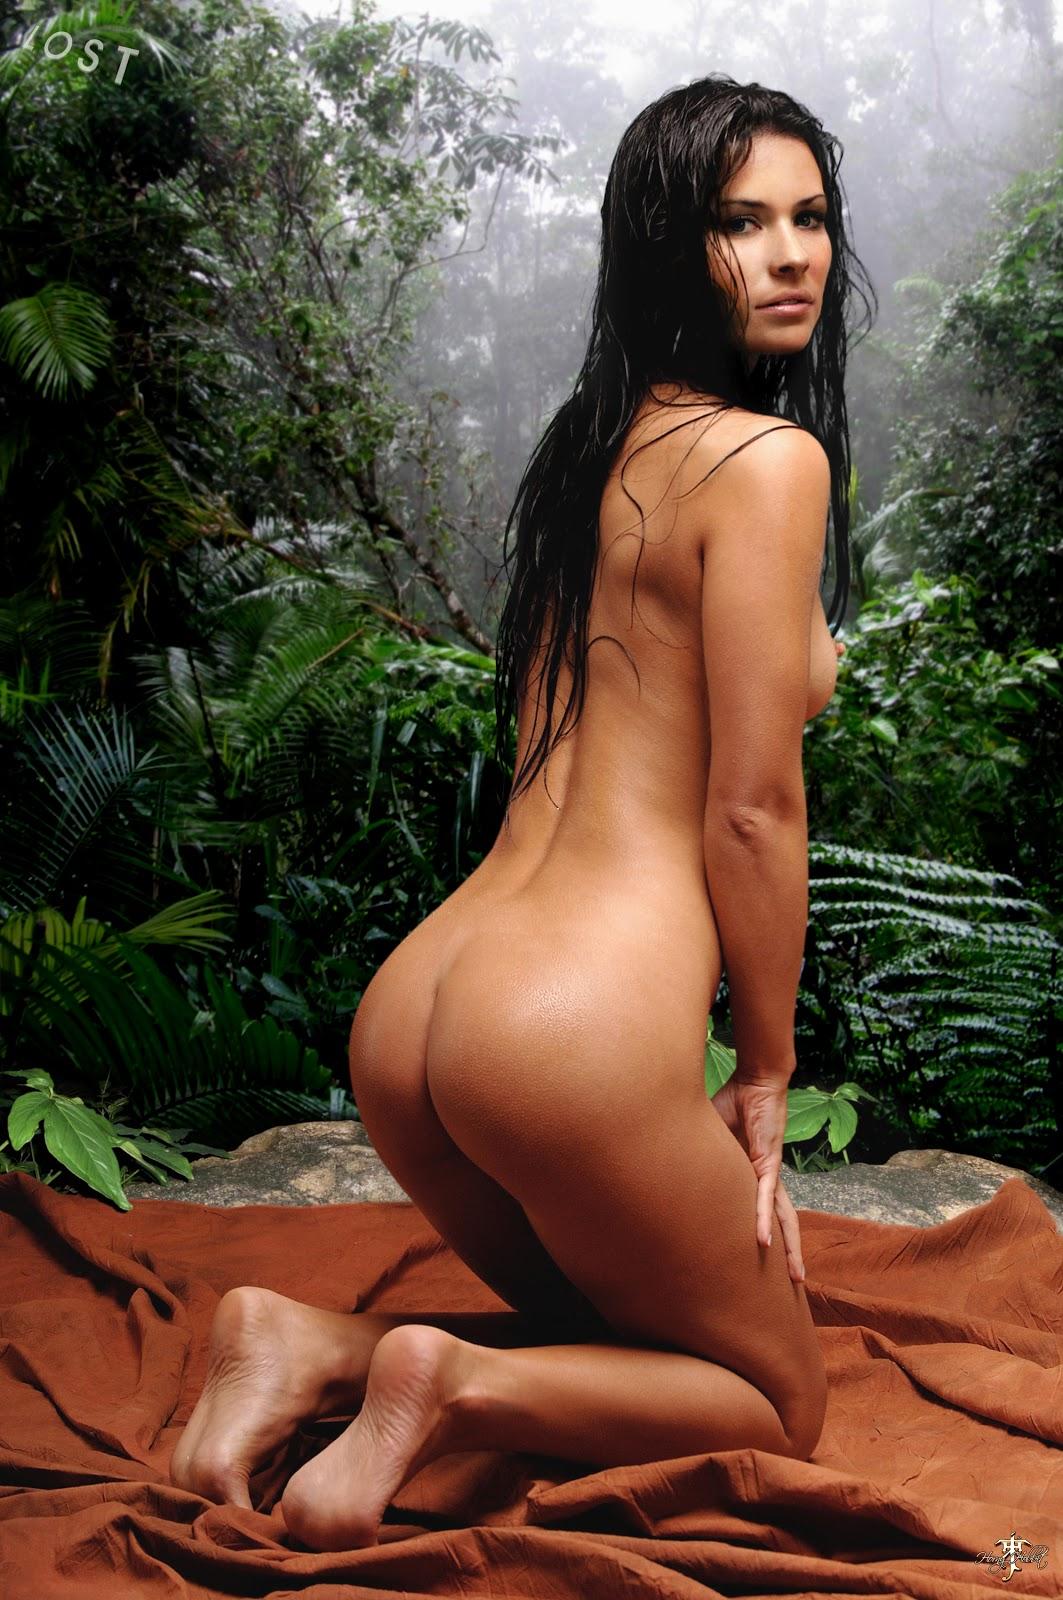 Evangeline lilly porn